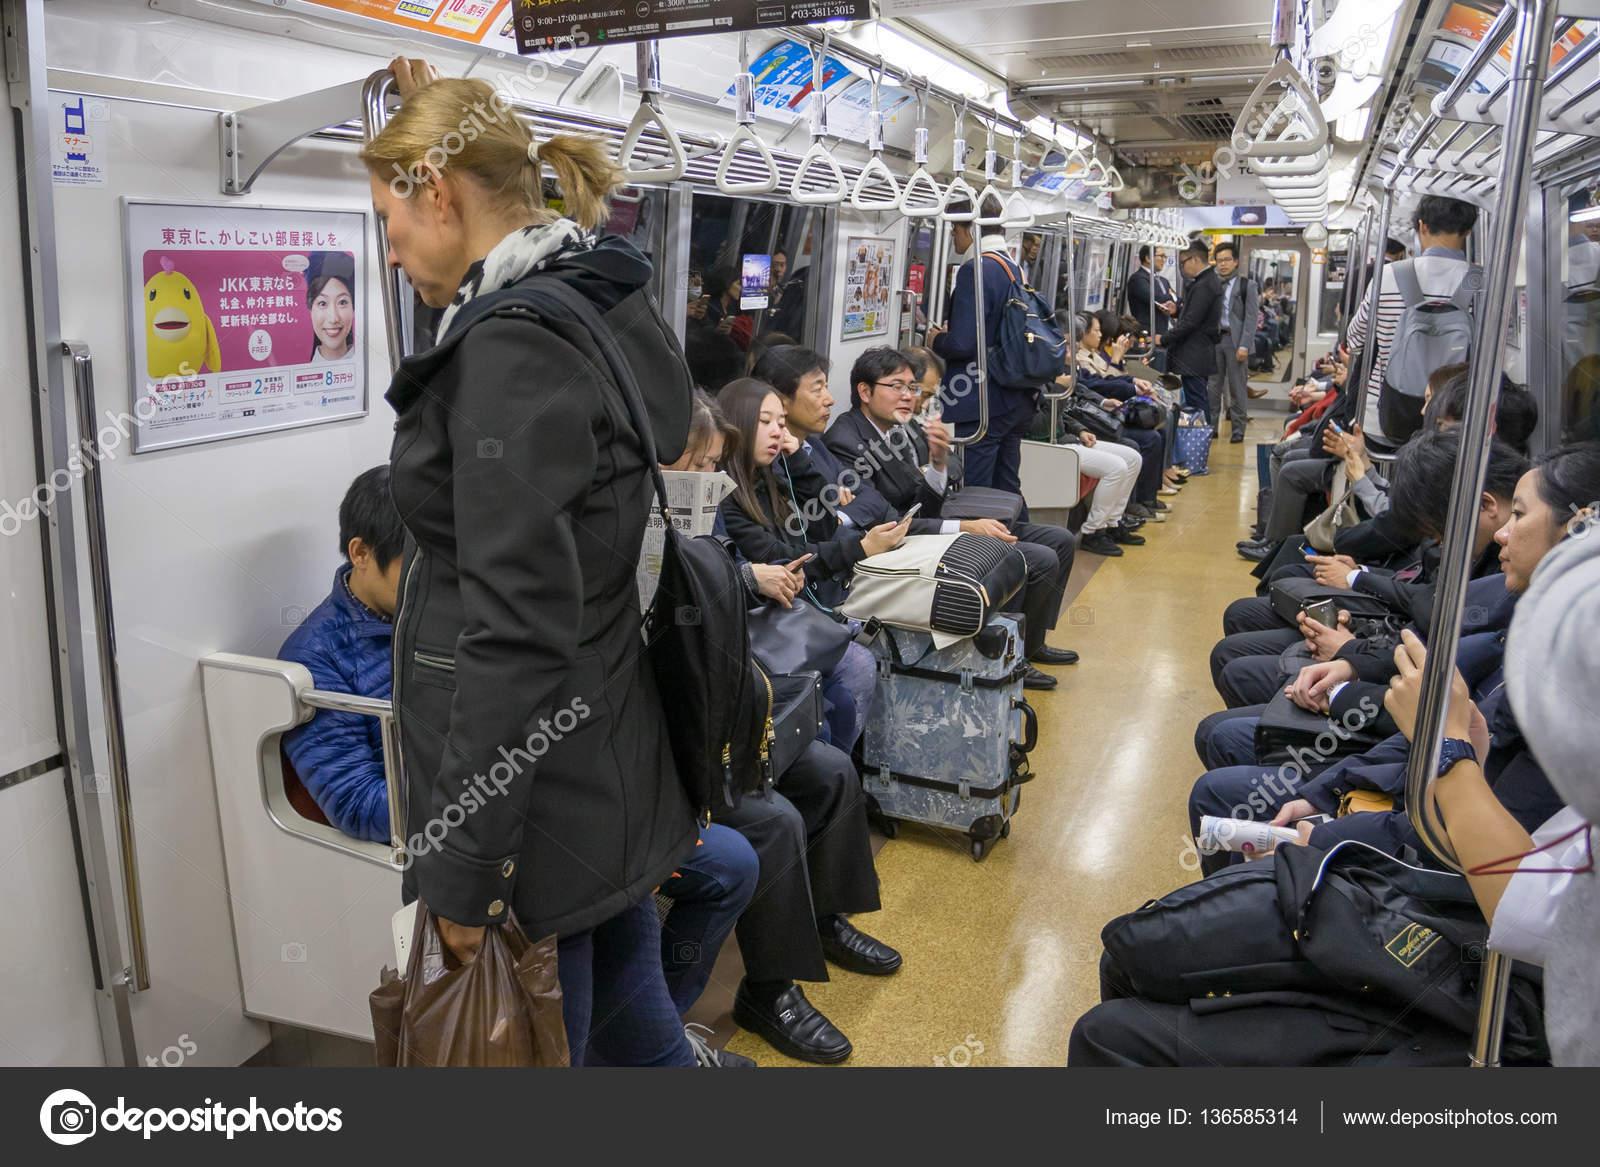 Jr 山手線の電車の乗客 - ストッ...